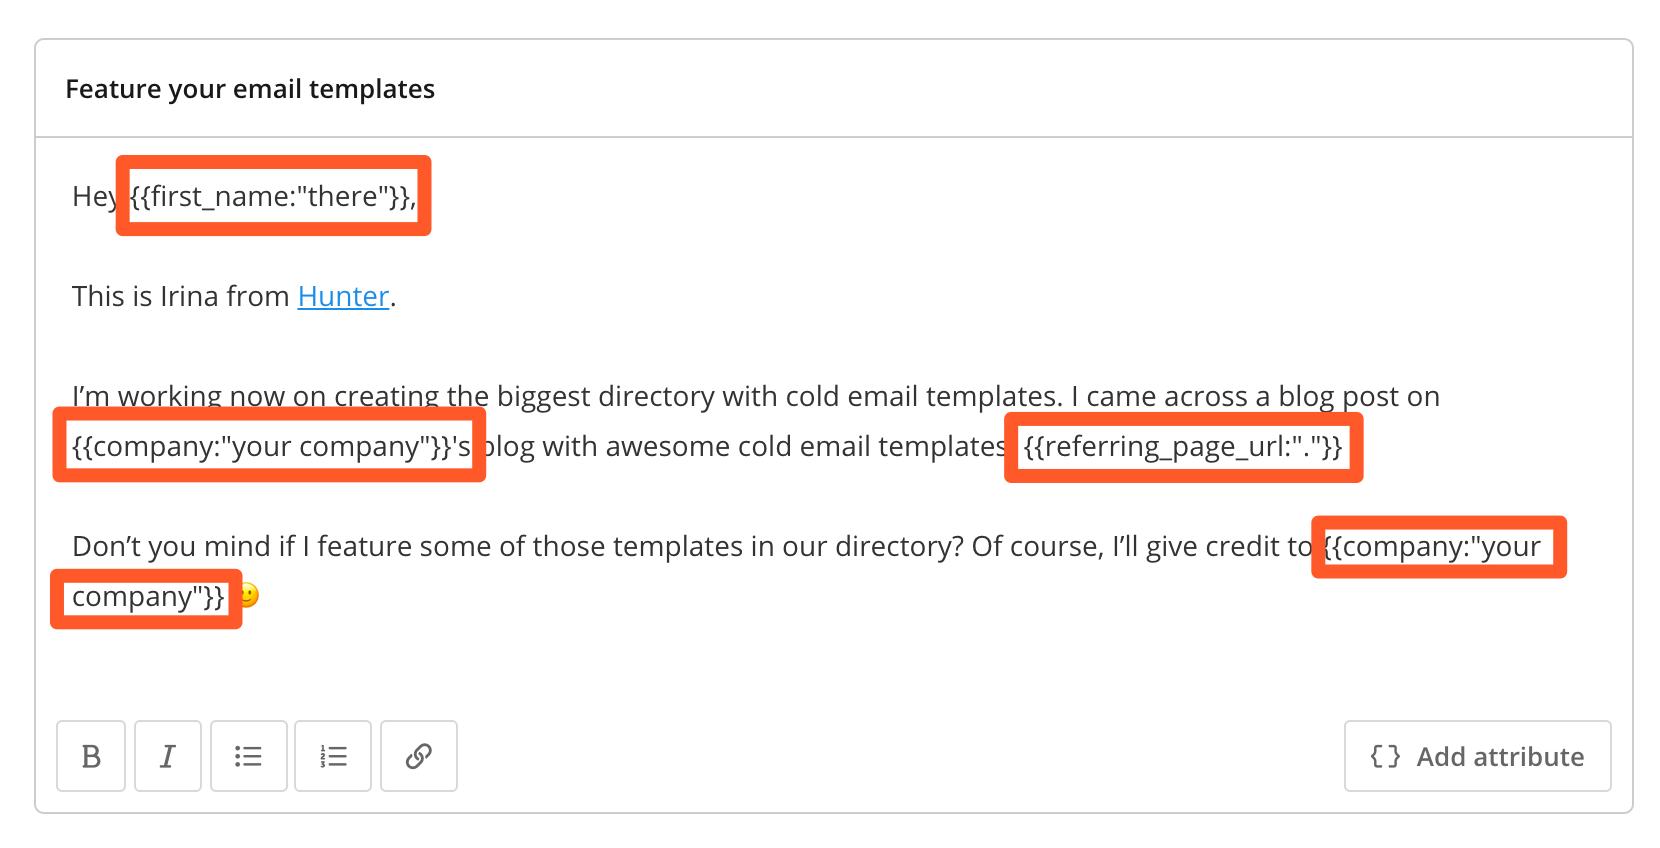 Custom attributes for personalization